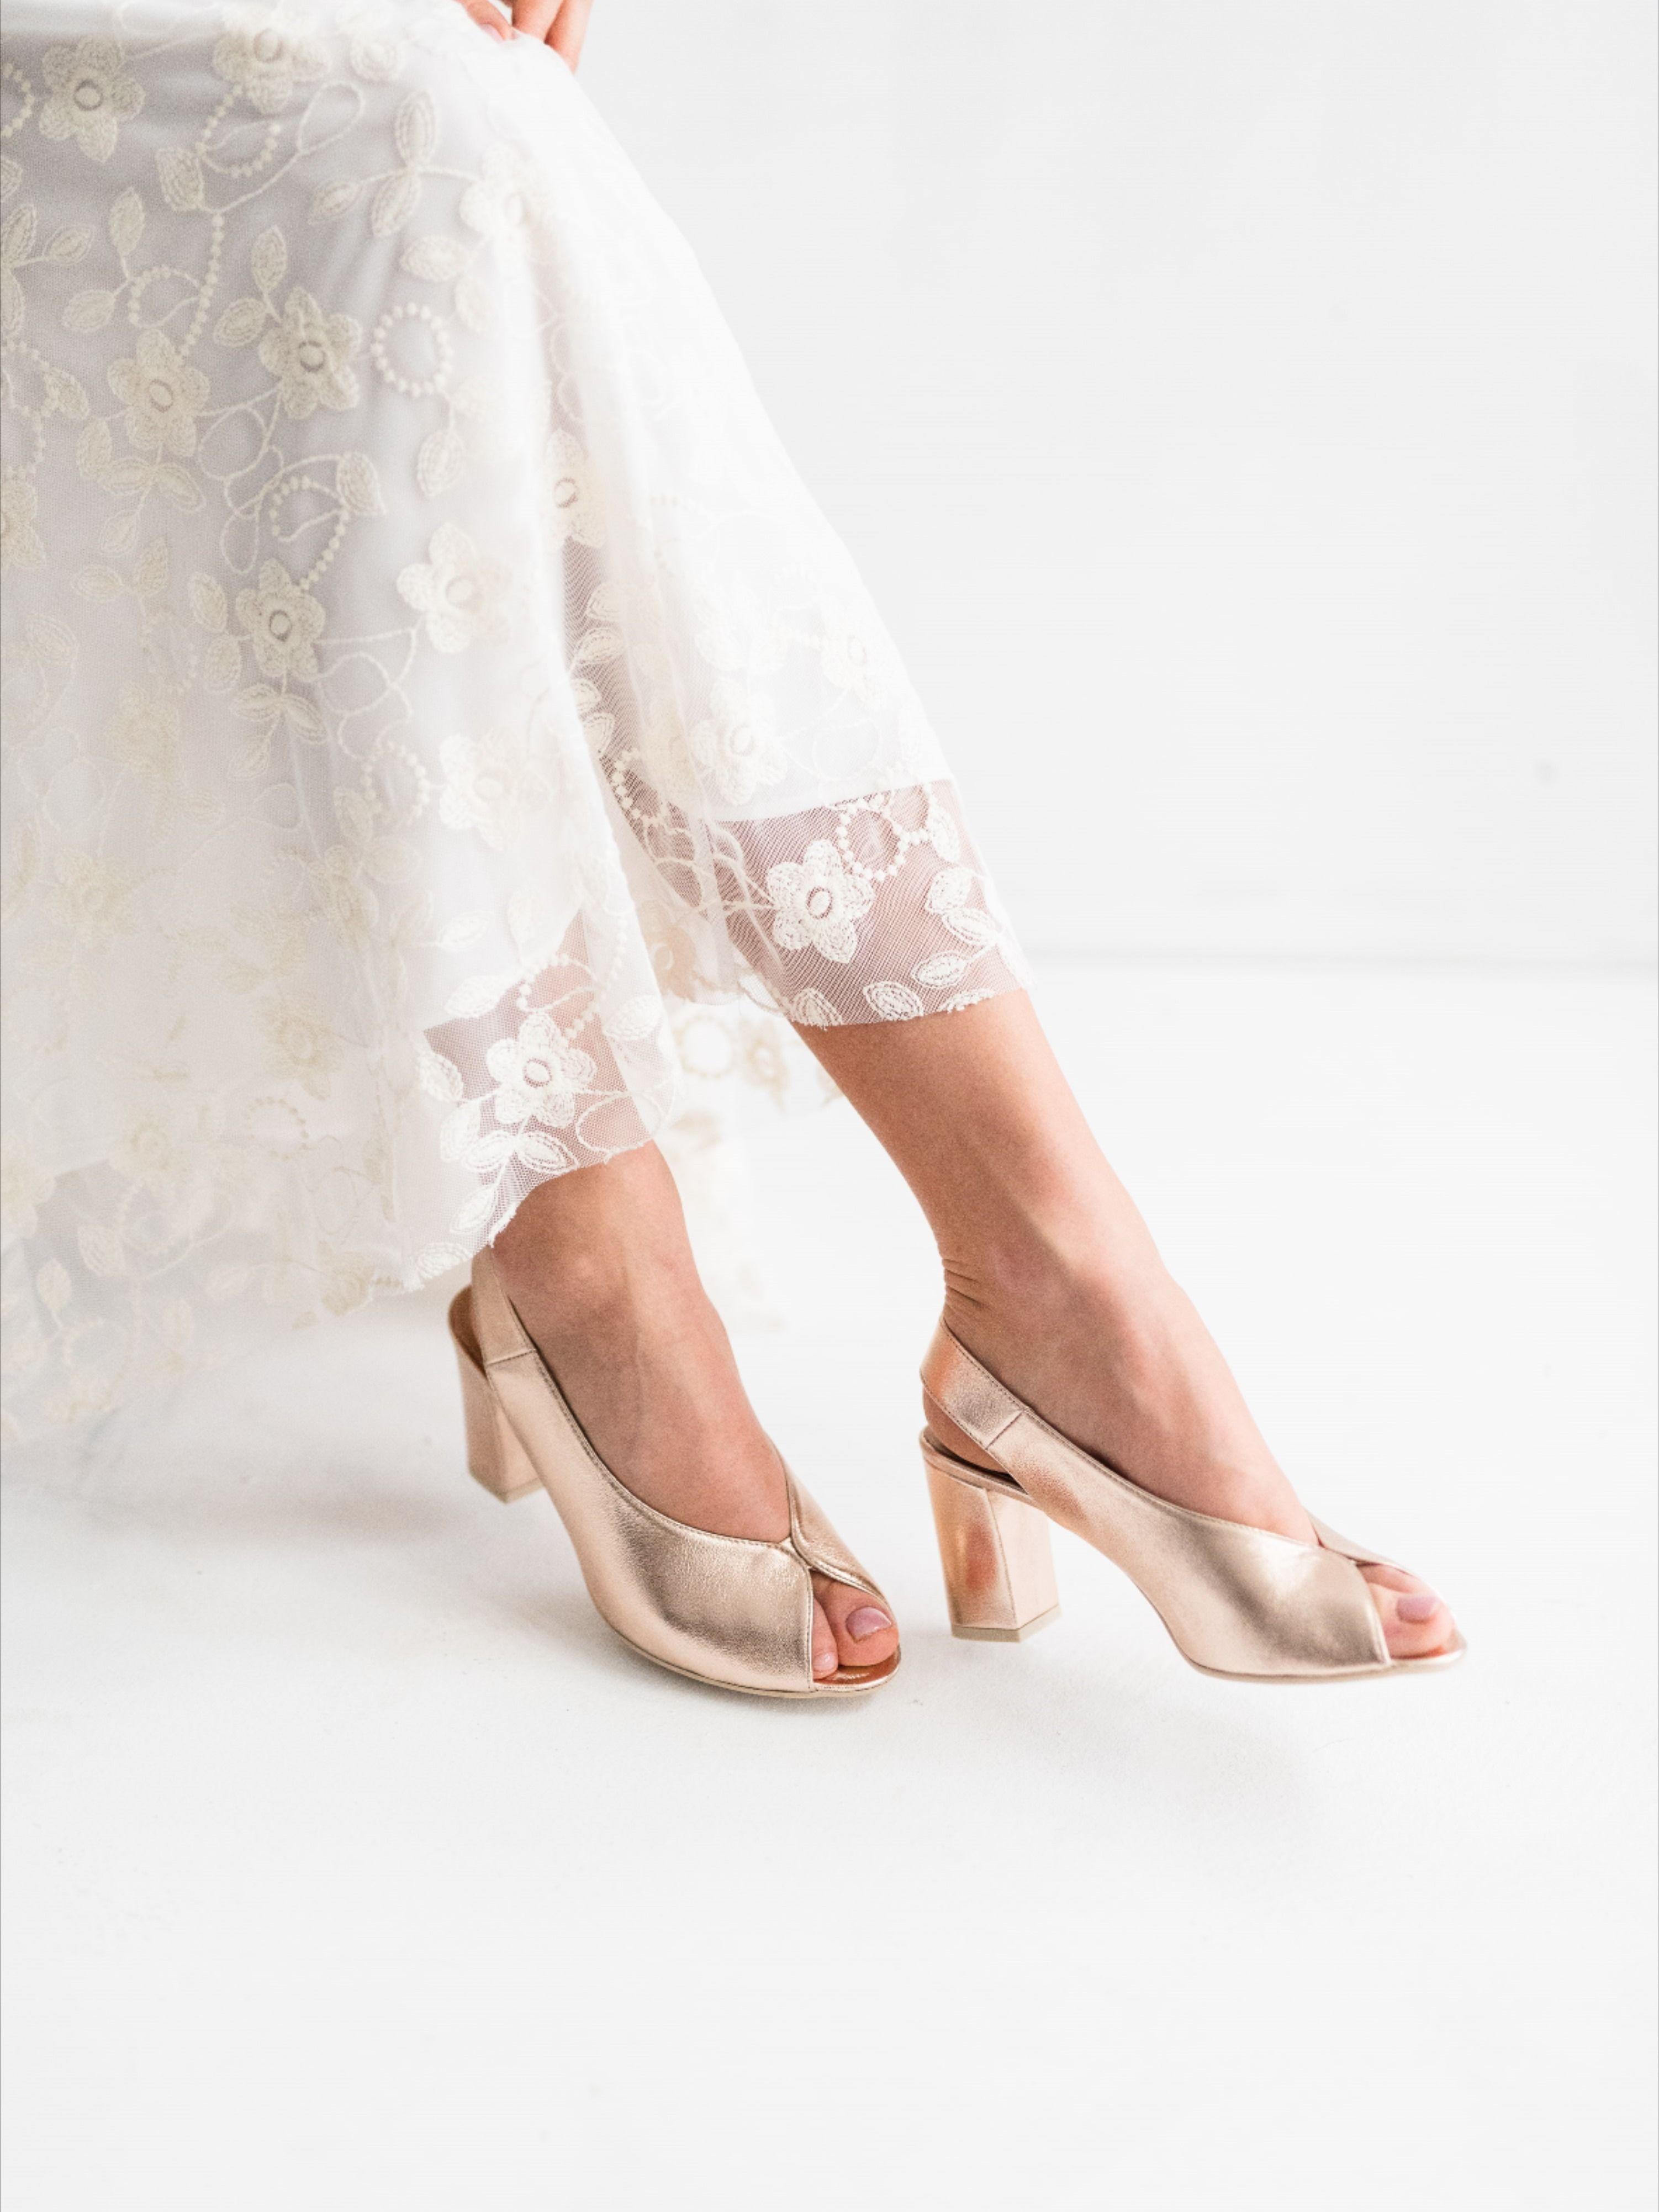 Buty Slubne Szyte Na Miare Wedding Shoe Heeled Mules Shoes